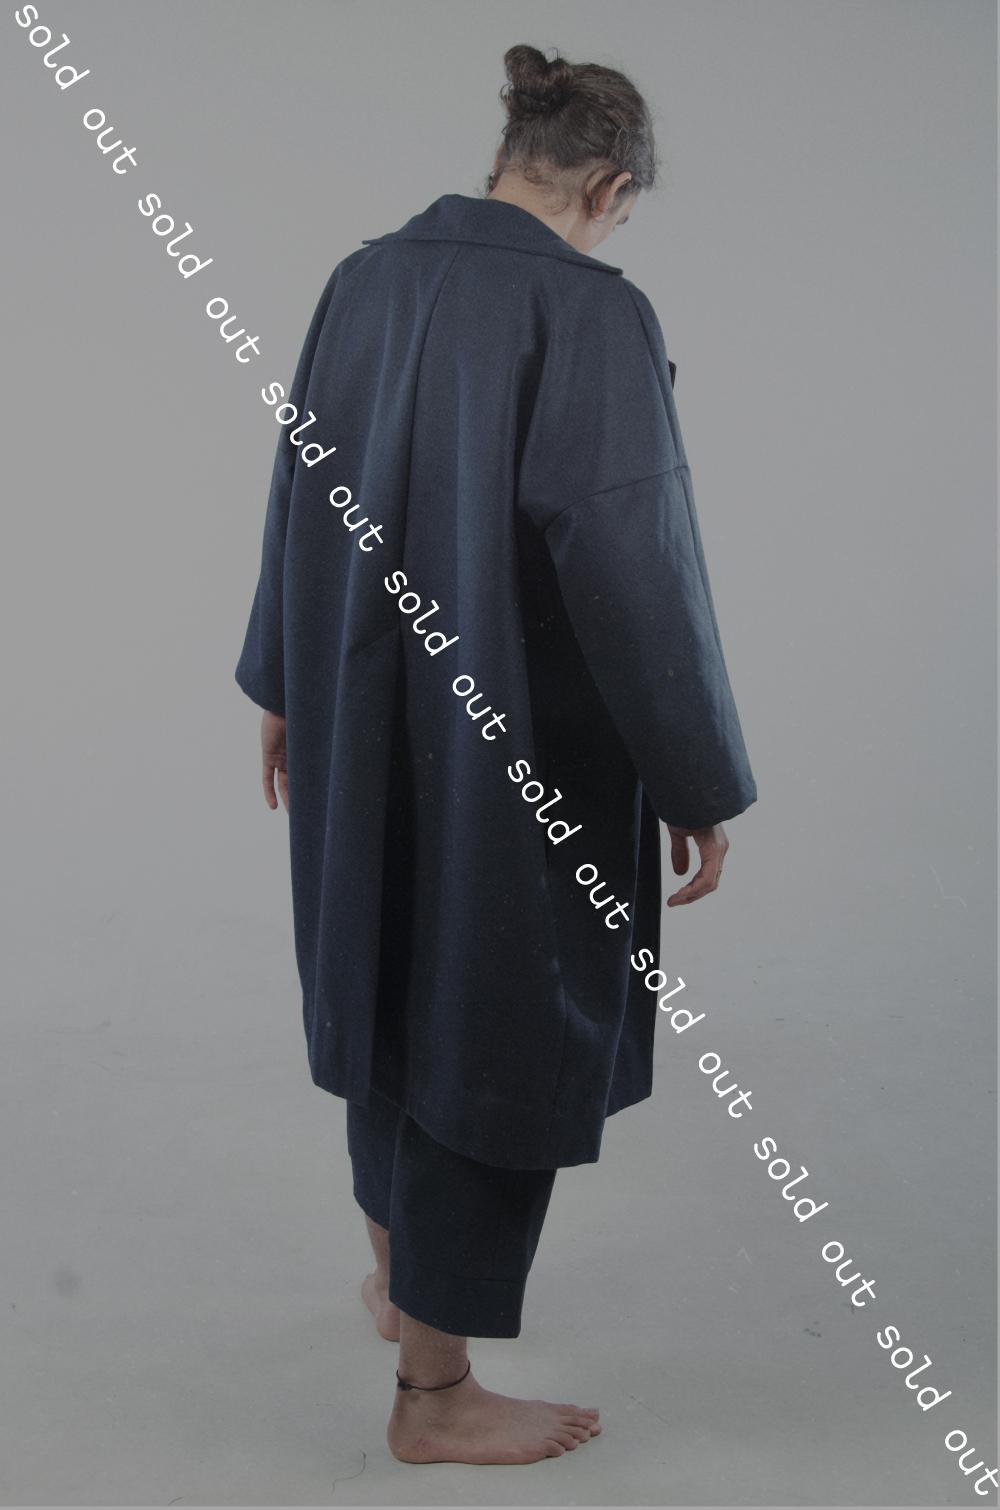 joseph-hollebon-kimono-coat-agoraphobia-collective